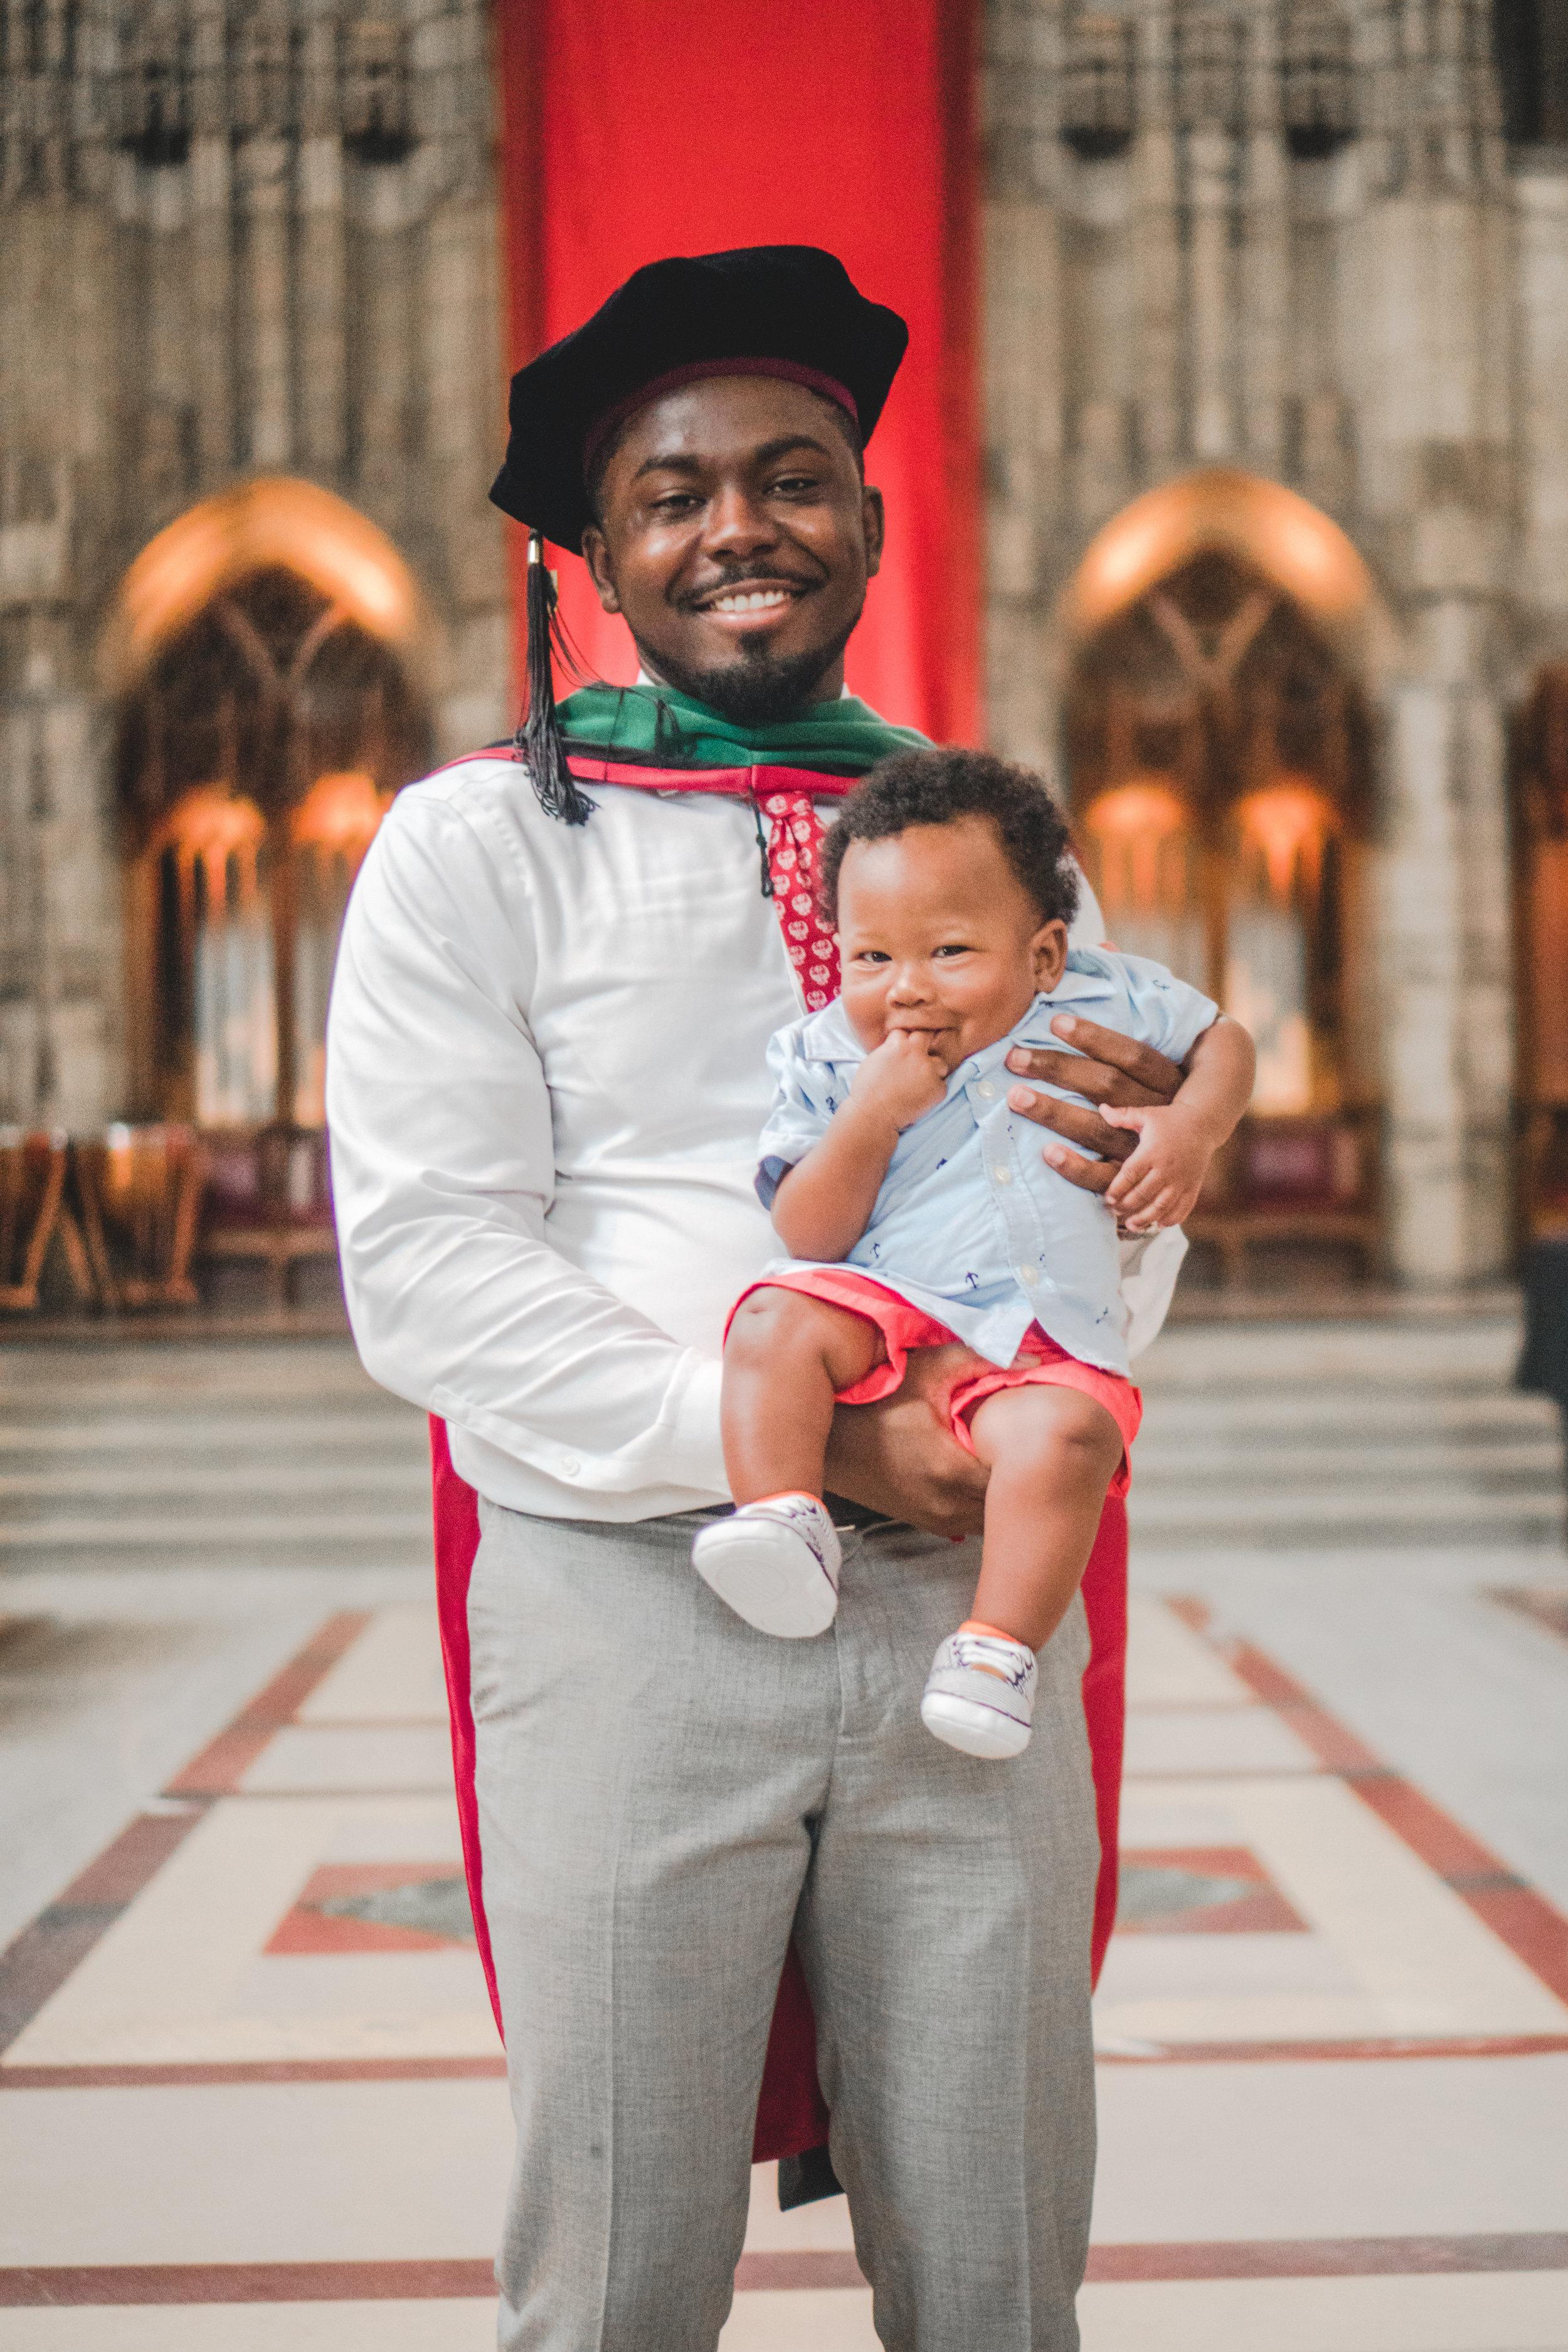 Jordan Green Graduation 5.25.18 - Datflipmel Photo & Films-43.jpg